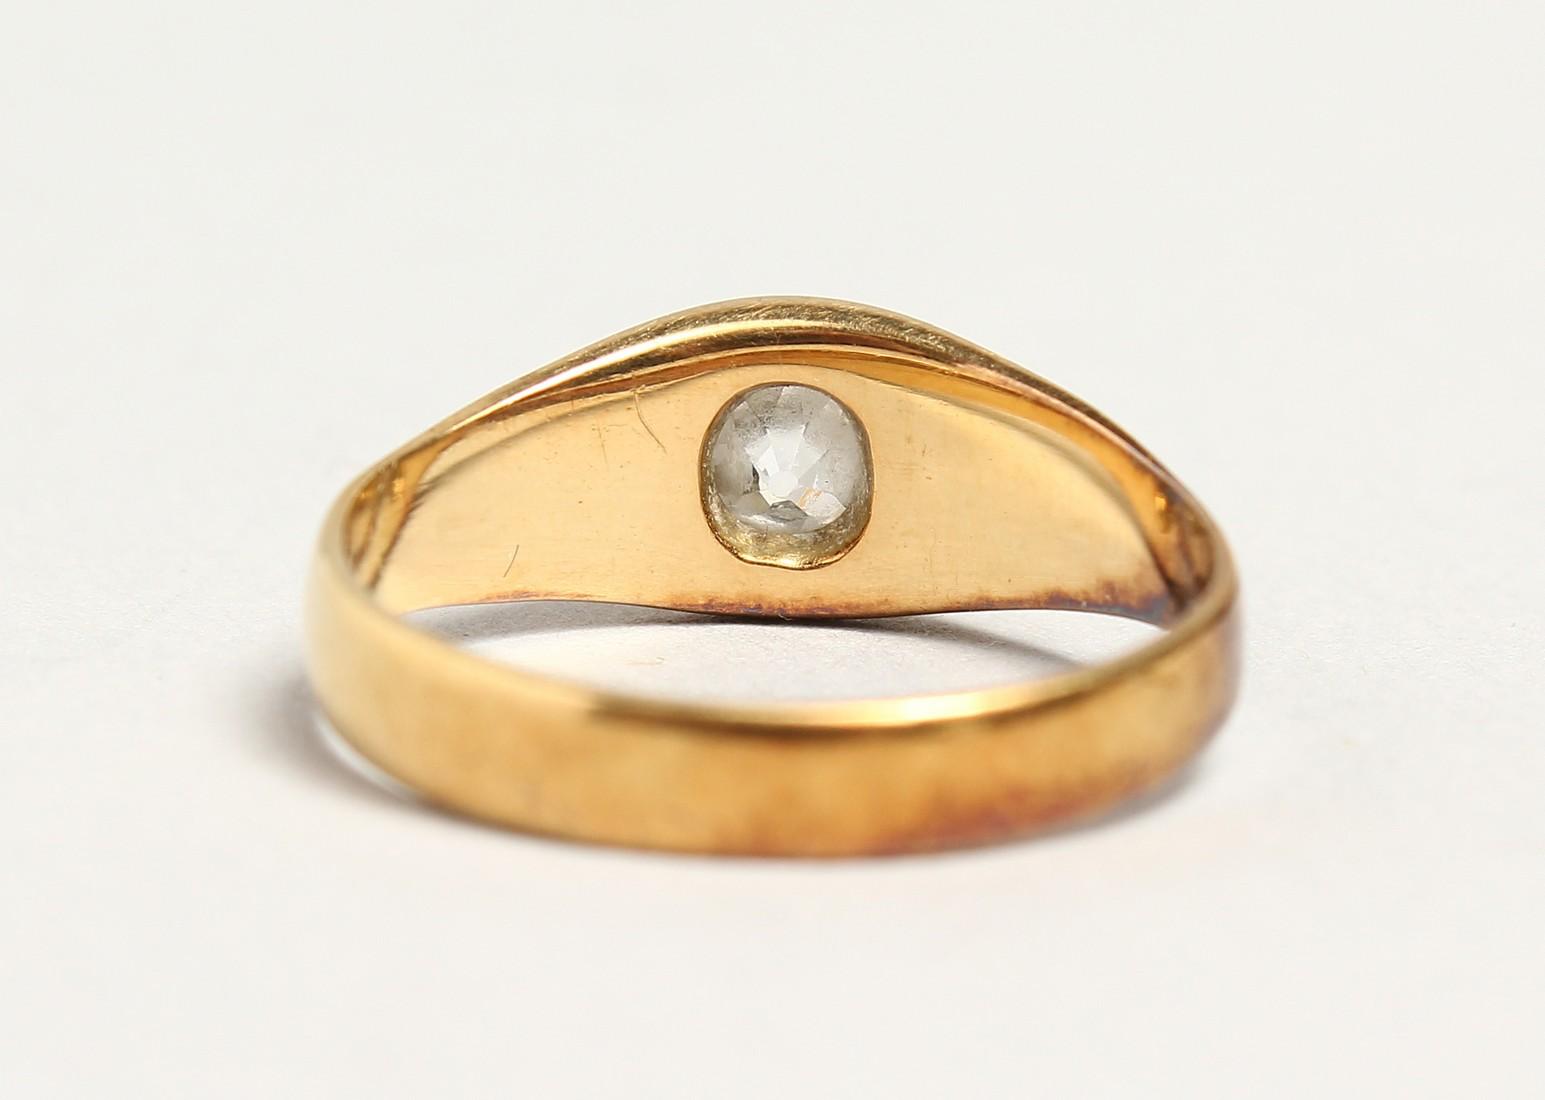 AN 18CT GOLD DIAMOND SET RING. - Image 3 of 4